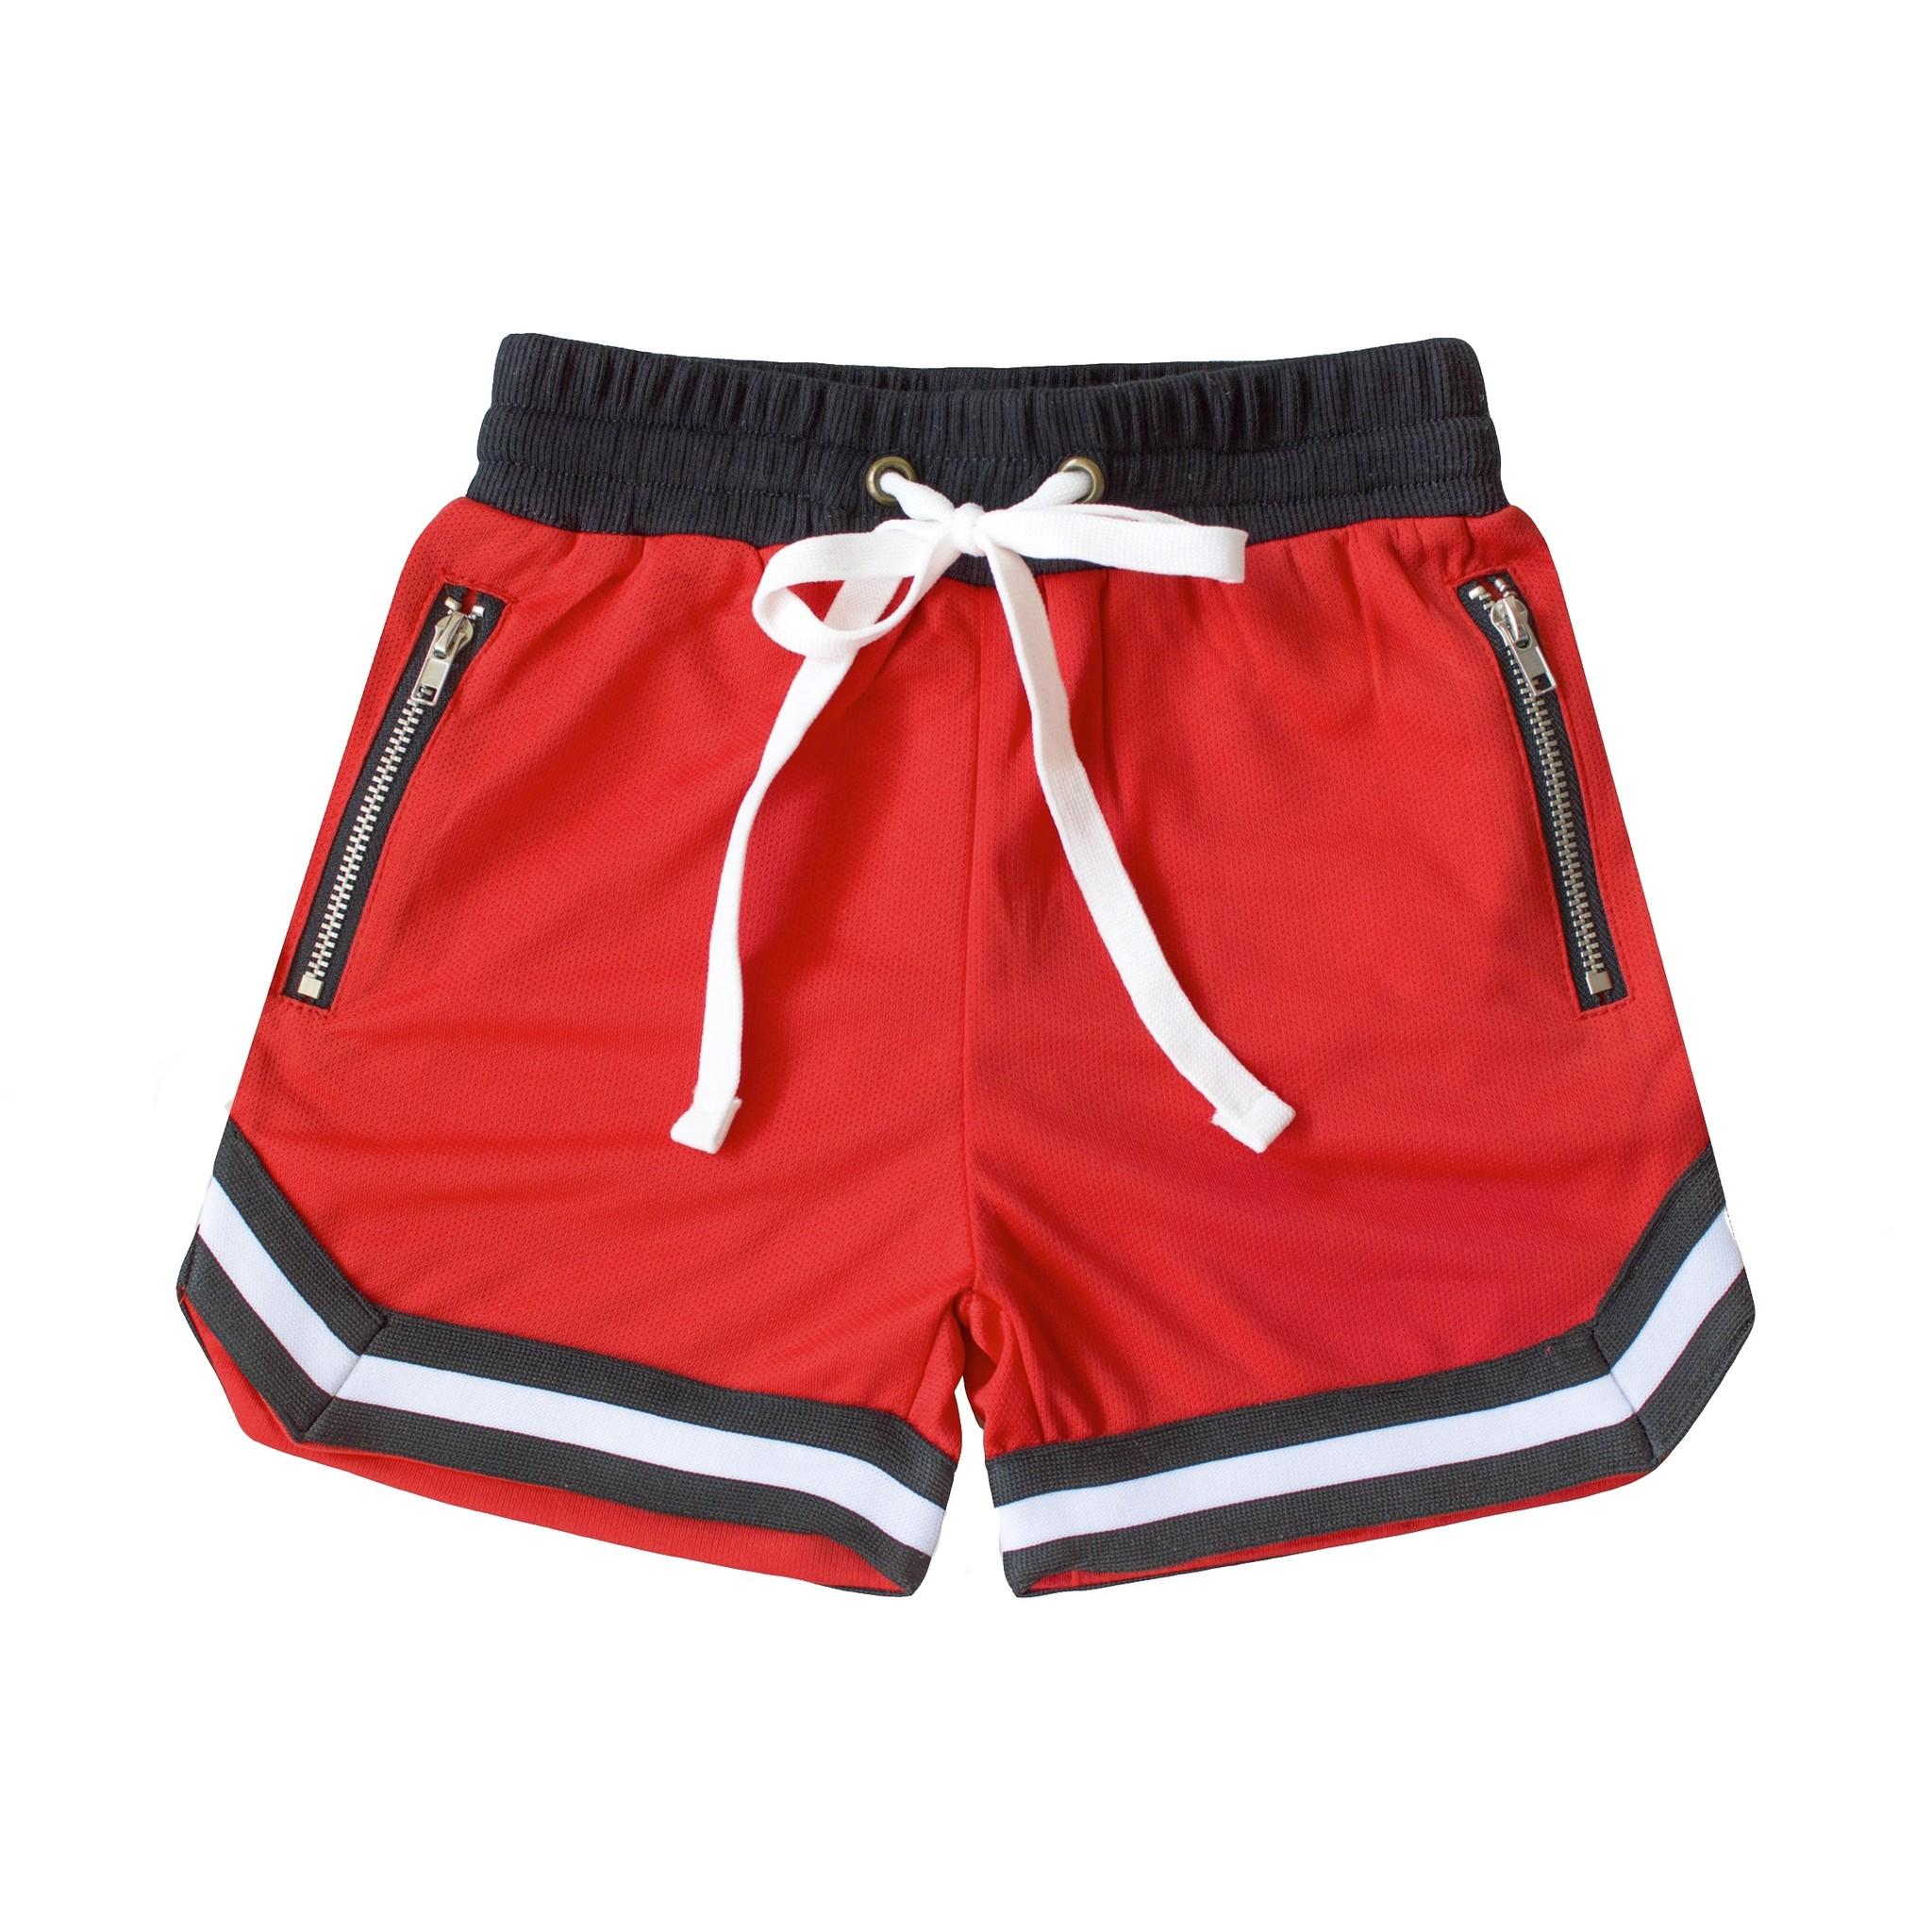 Beaubella Kids RED BASEBALL SHORTS | RED COMFORTABLE SHORT PANTS | BEAUBELLAKIDS